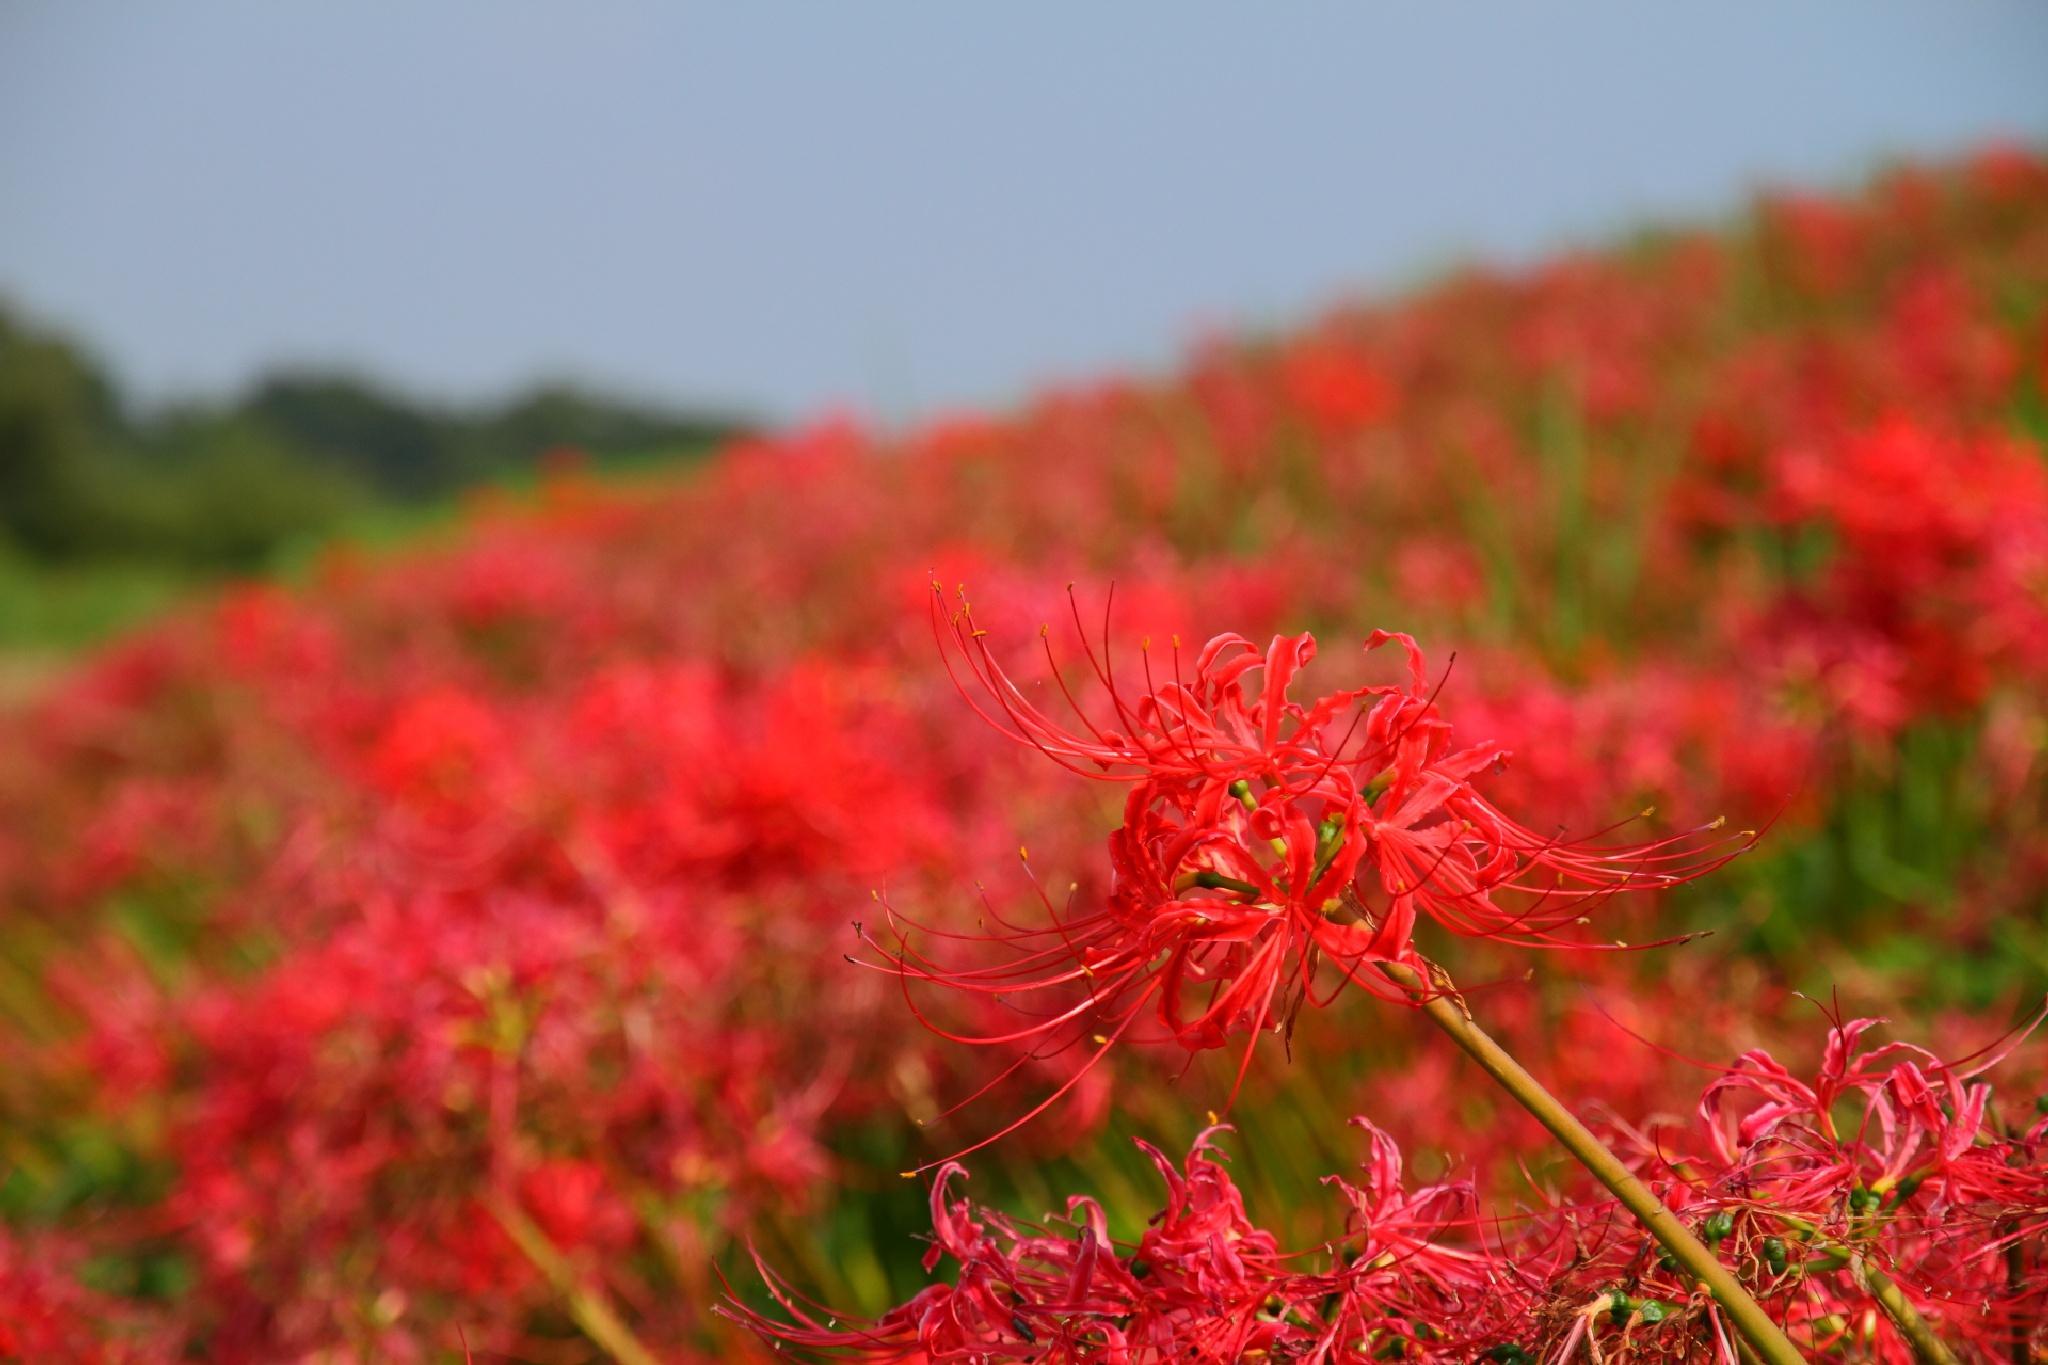 Red Spider Lily in Red by takashi.mizoguchi